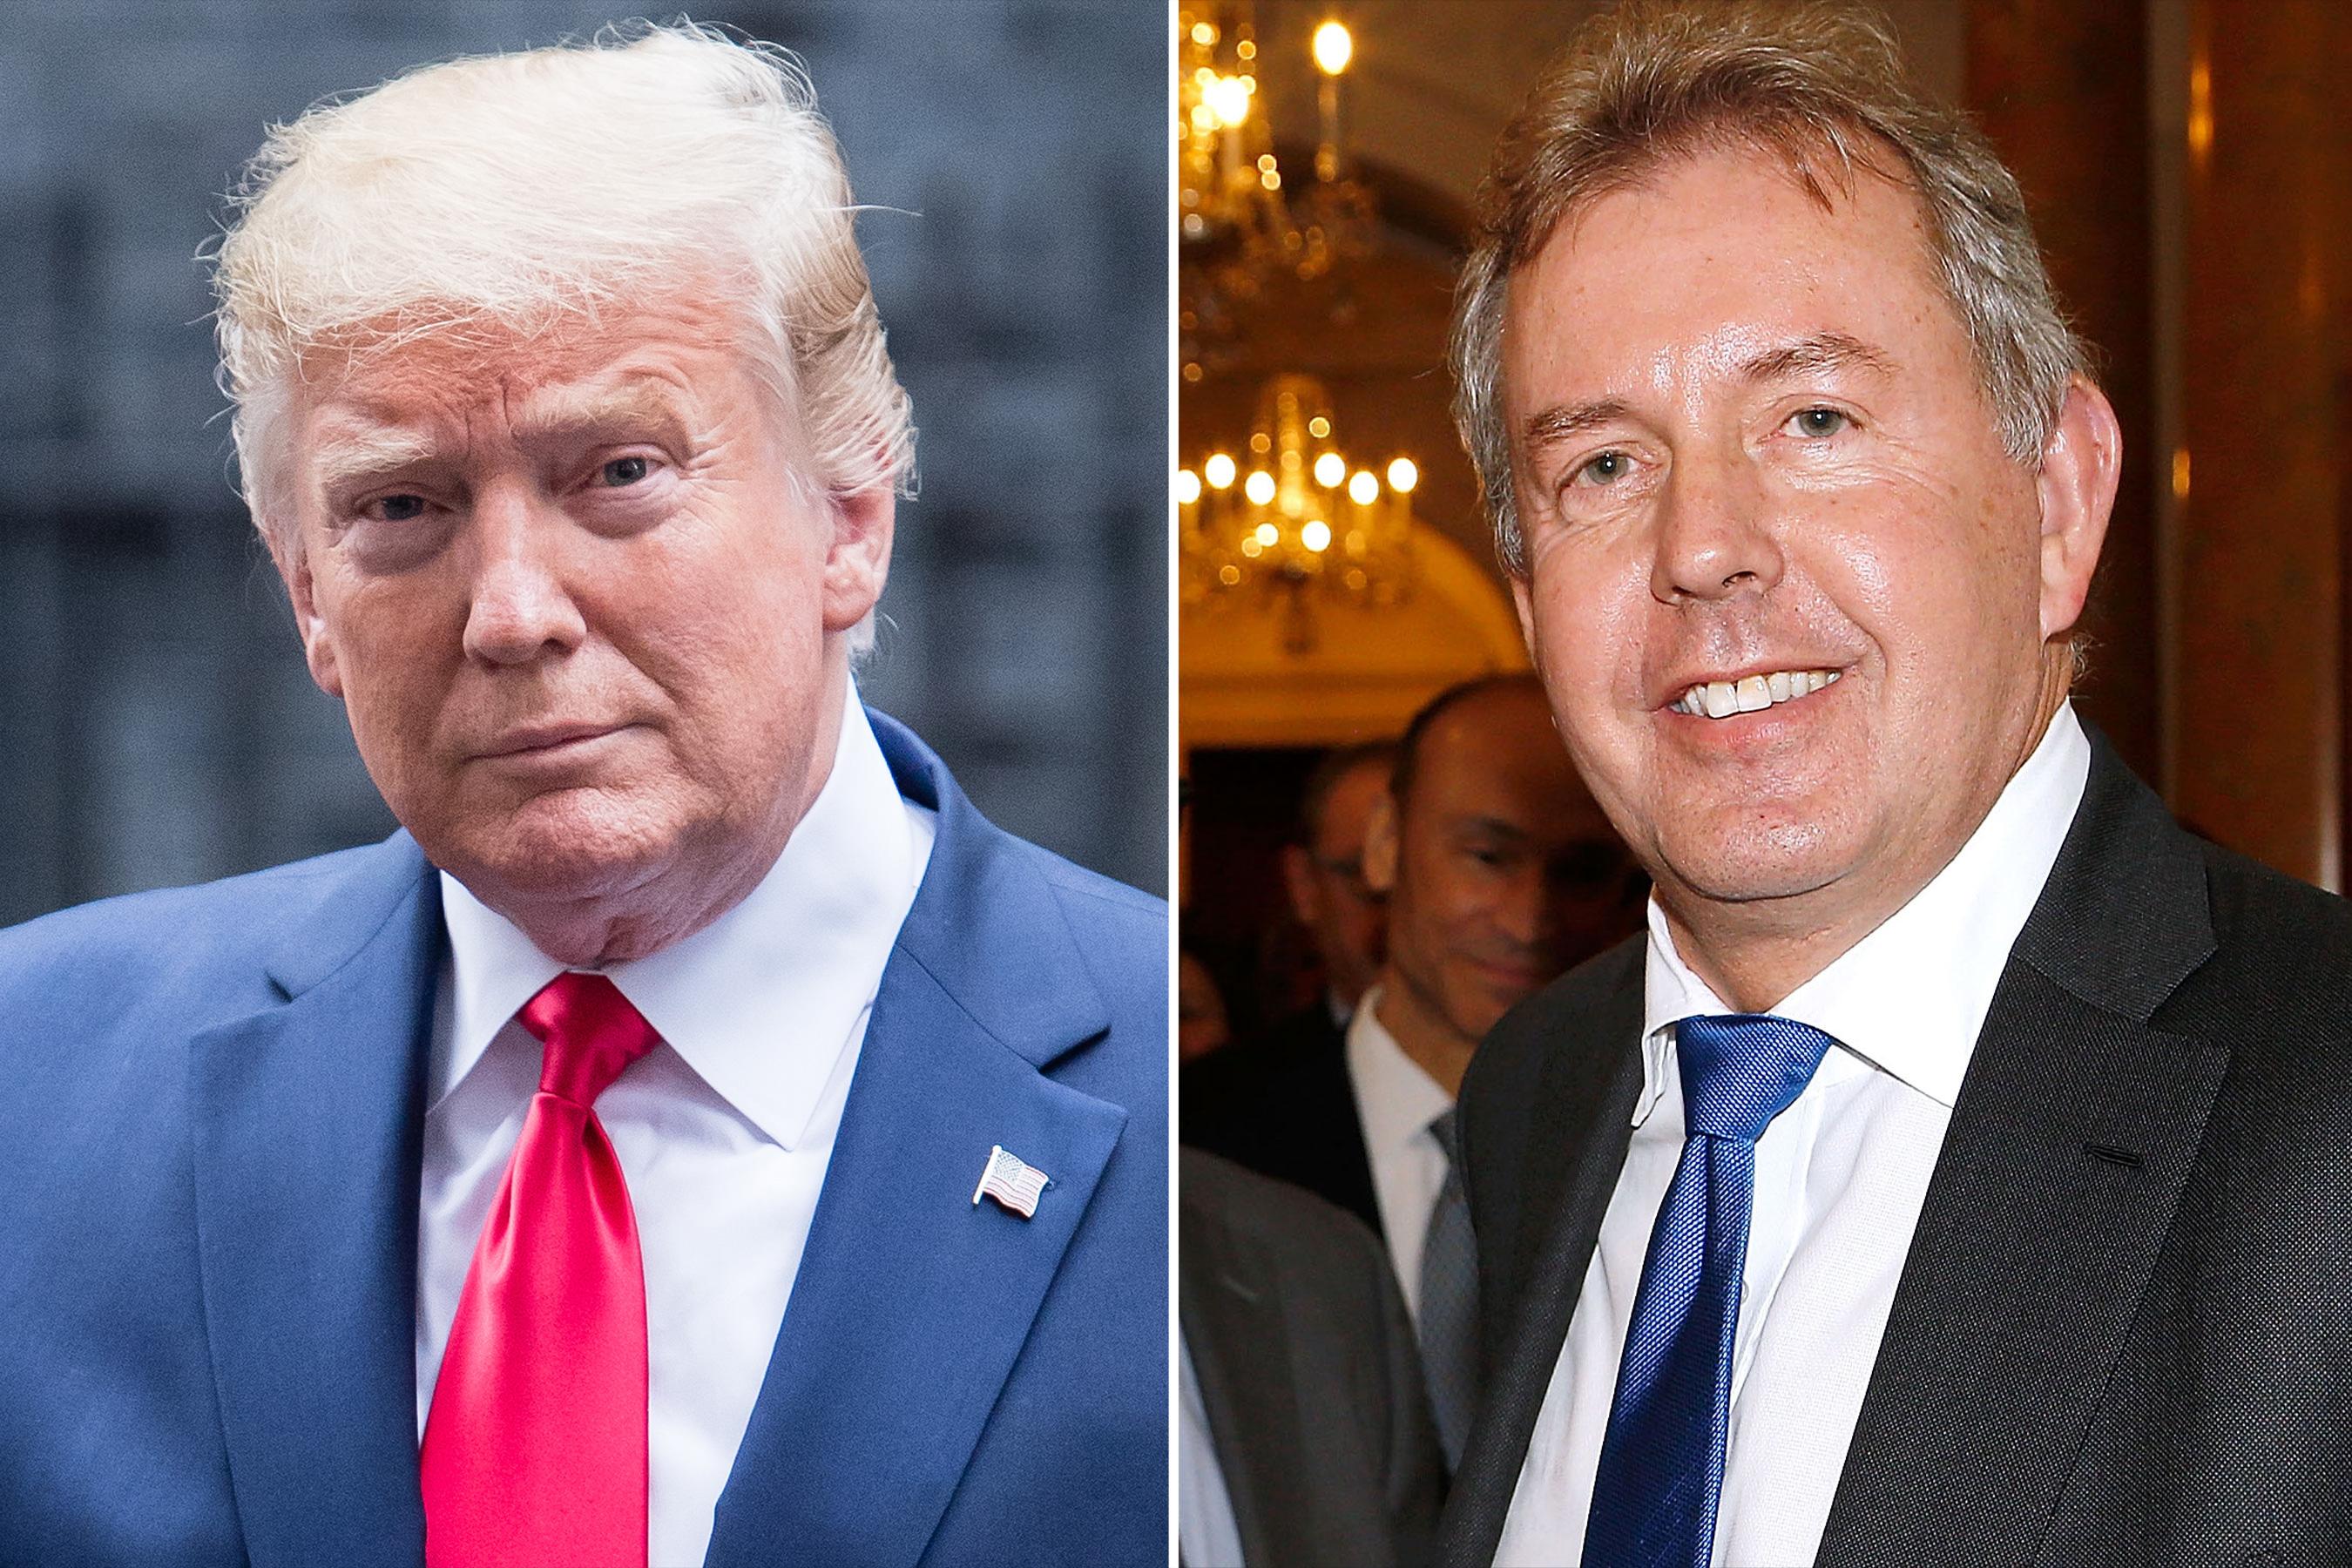 Will UK recall their ambassador to US?